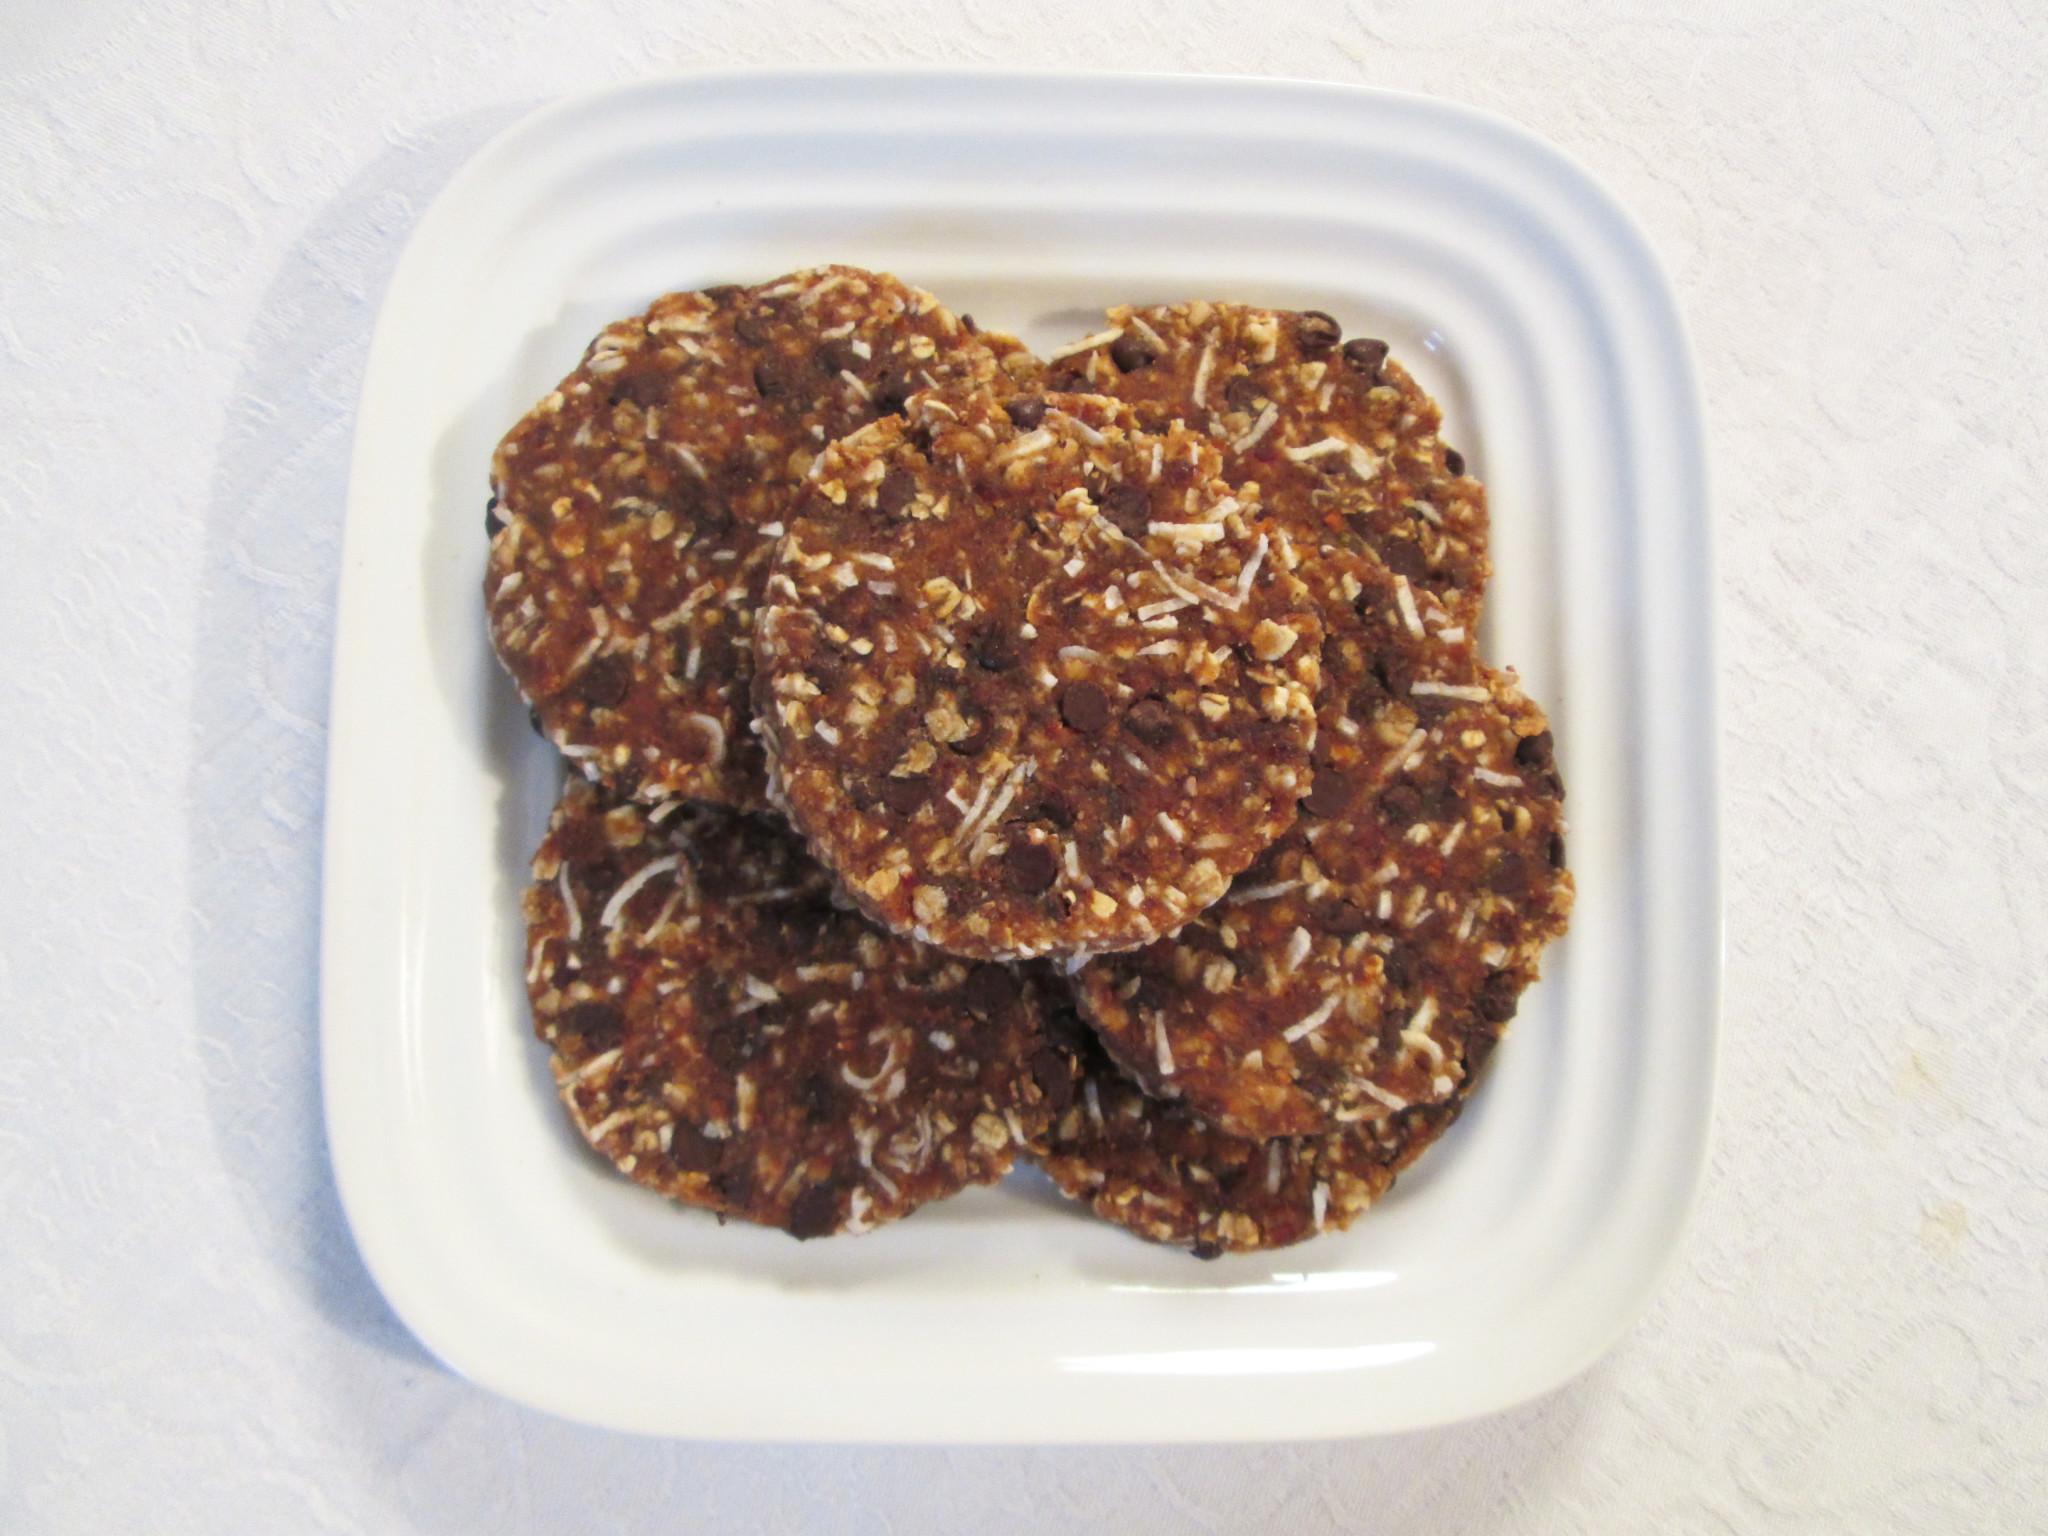 Oatmeal, Coconut Date Cookies Recipe - Robins KeyRobins Key